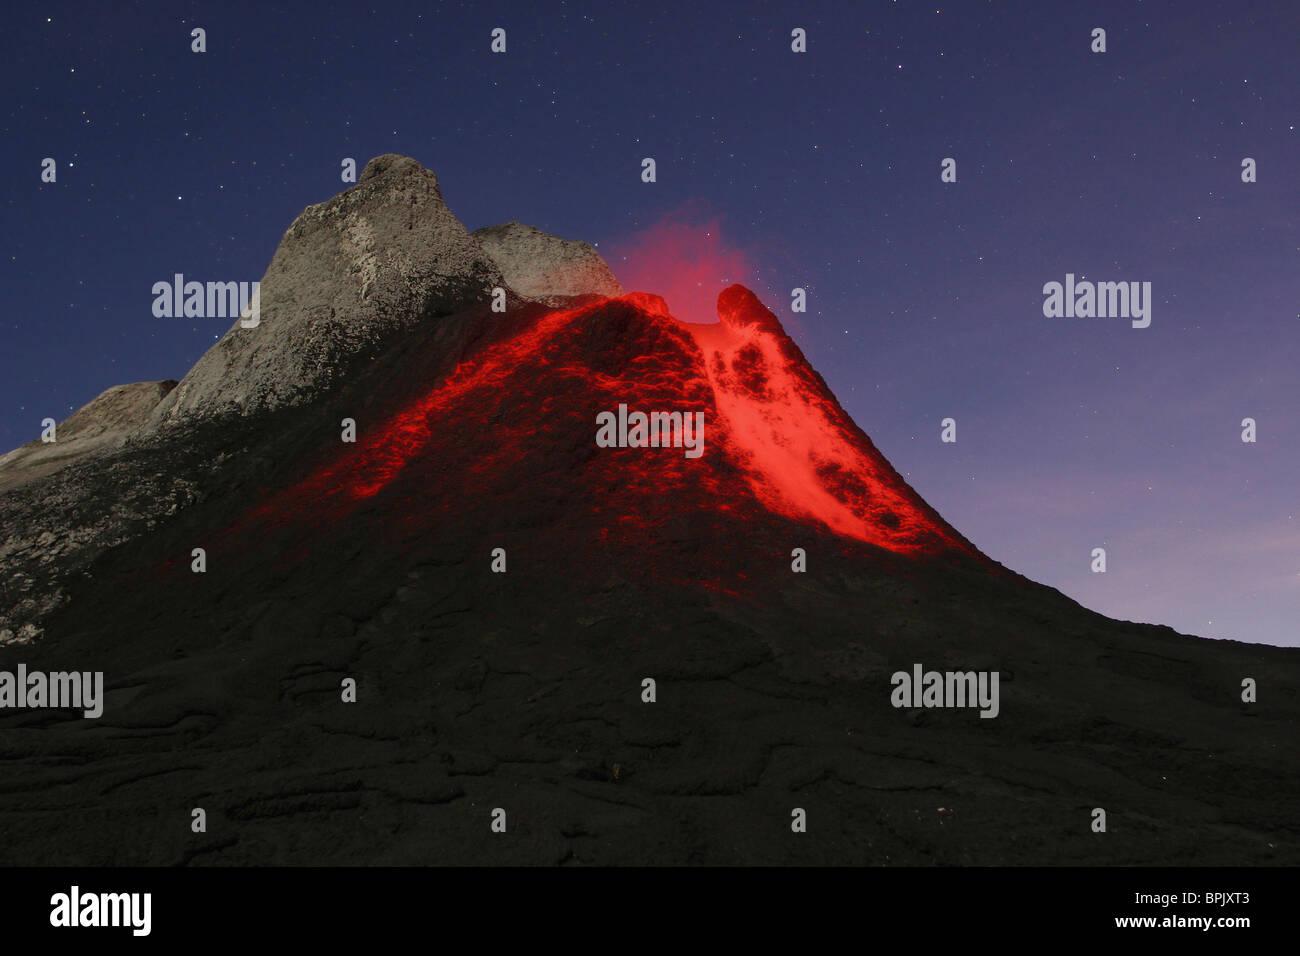 July 5, 2004 - Ol Doinyo Lengai eruption, Rift valley, Tanzania. - Stock Image